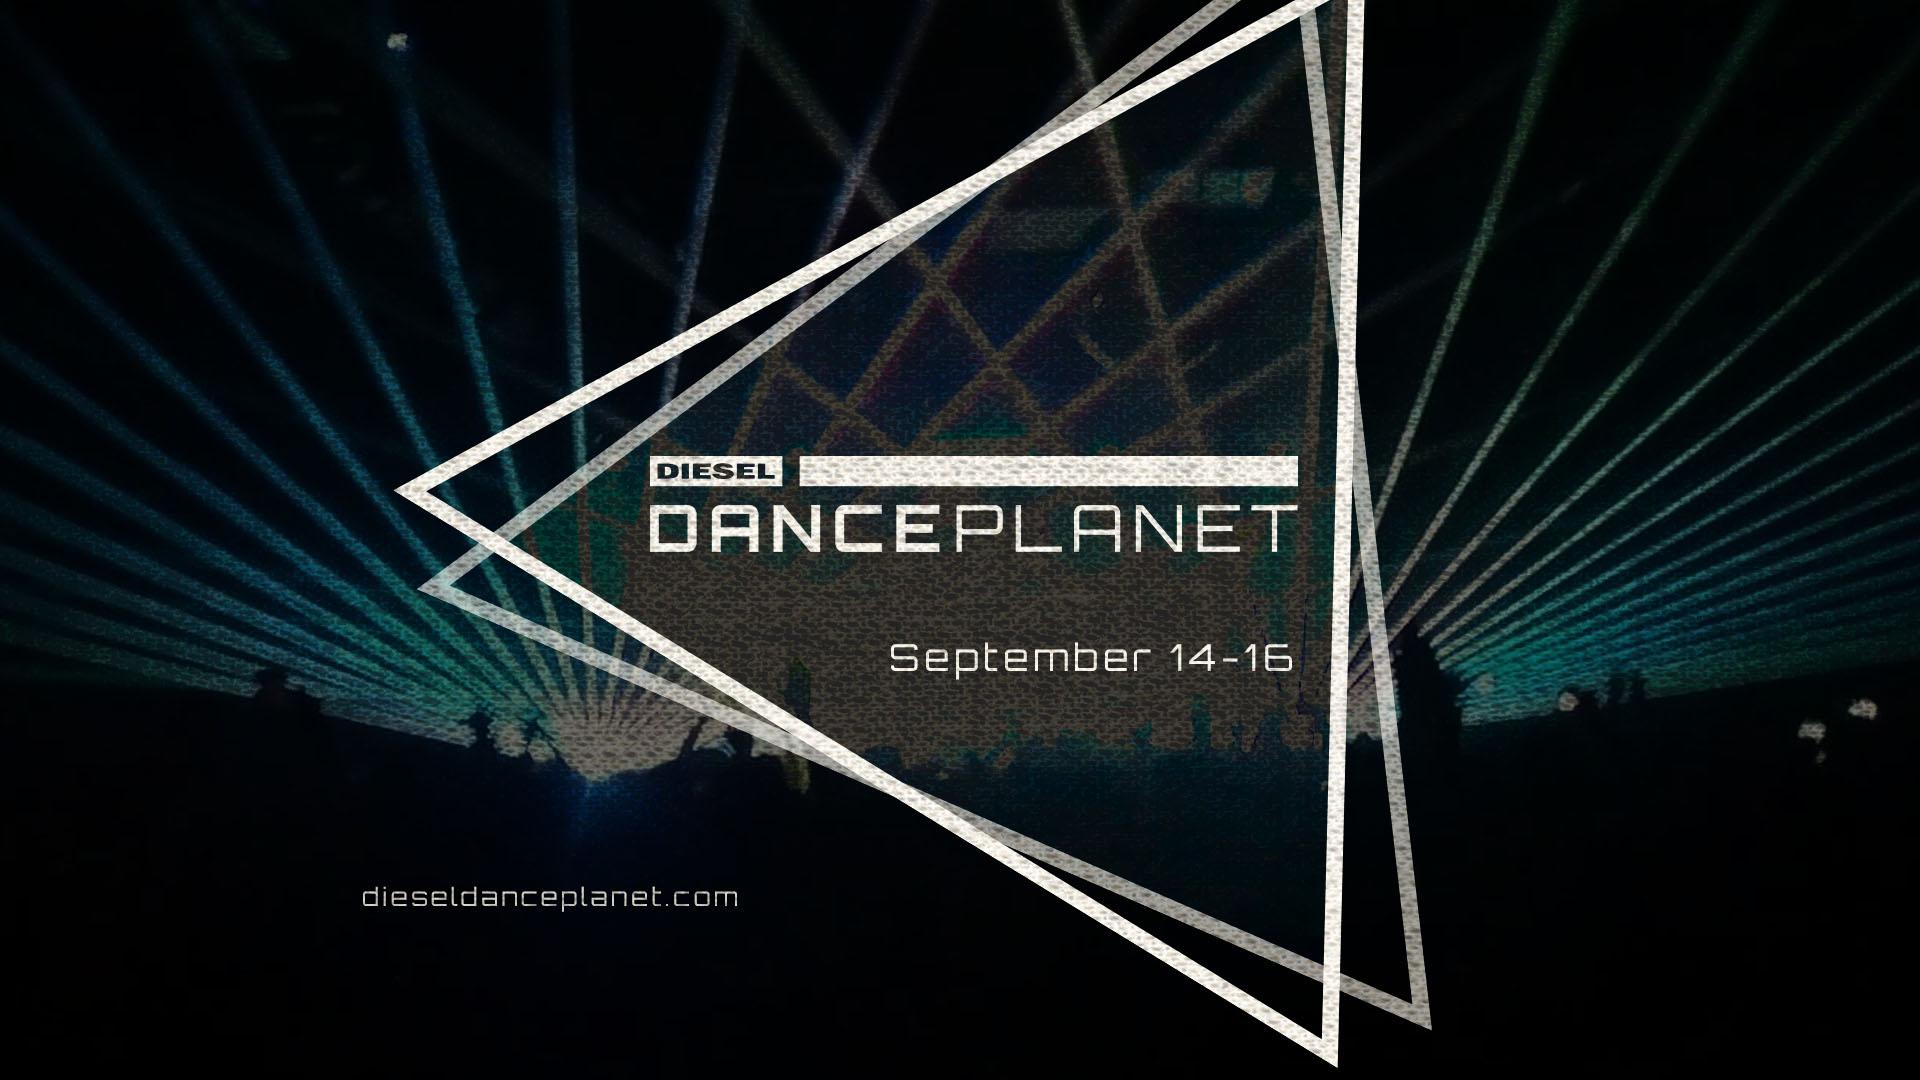 04_diesel_dance_planet_frame_06.jpg